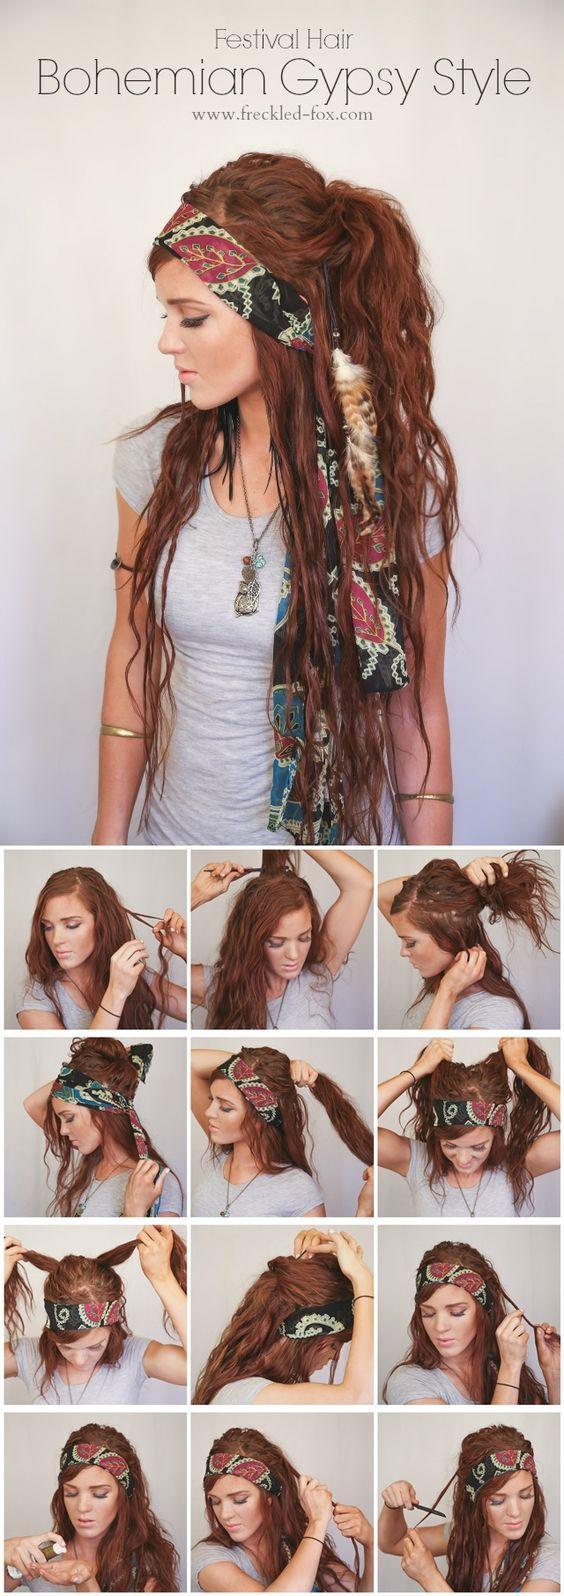 Step by step bohemian hair tutorial – the bohemian gypsy style